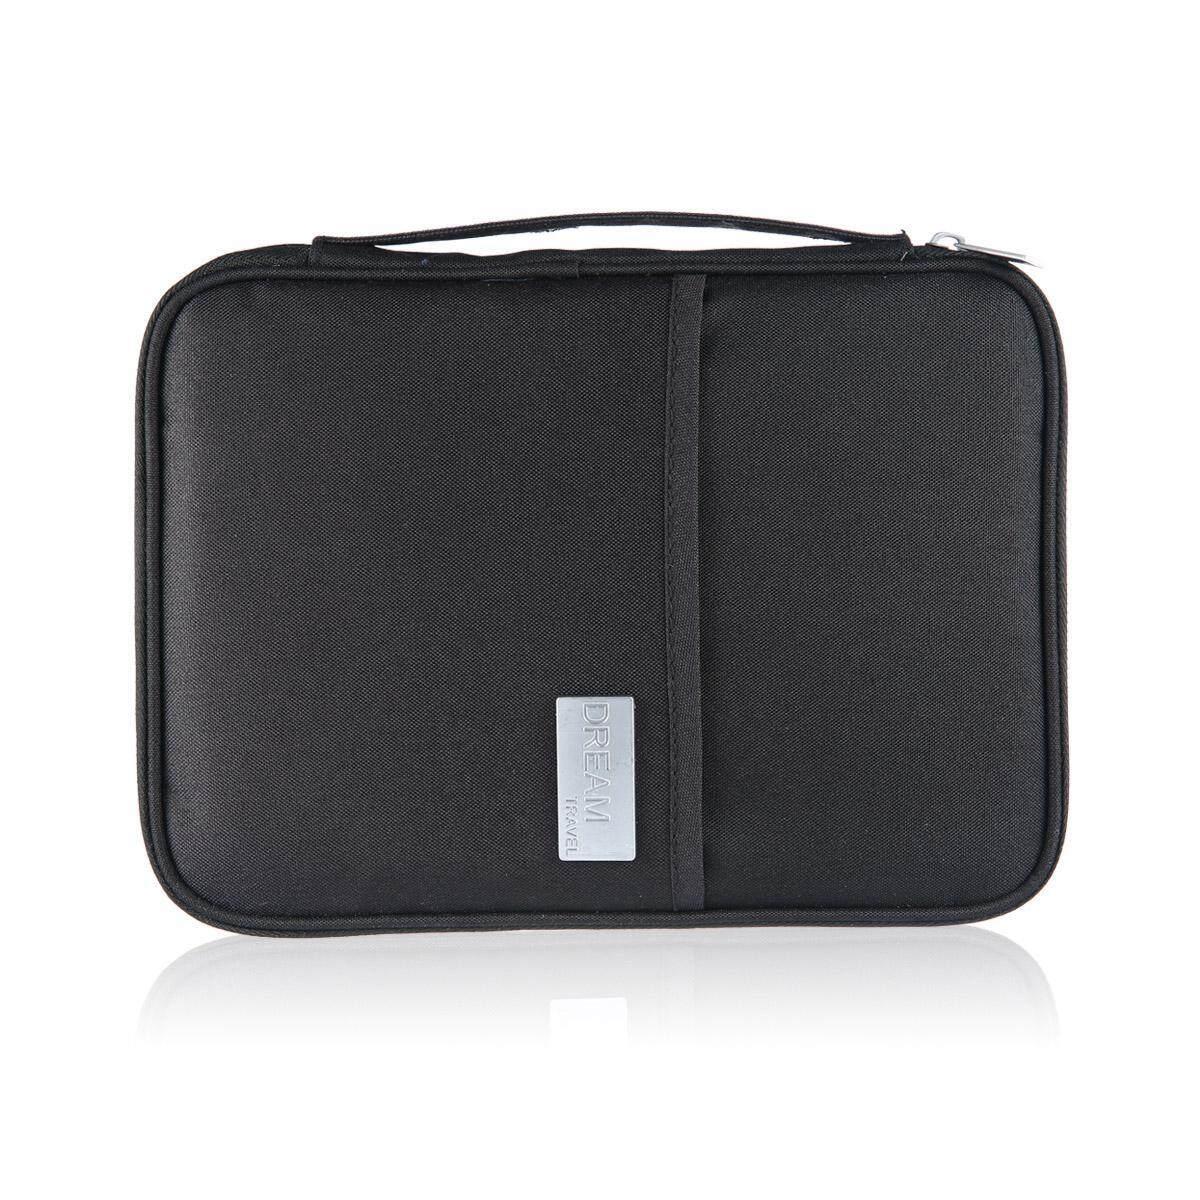 c1c3d0b43249 I-Cloud Travel Wallet Family Passport Holder, RFID Travel Passport  Wallet,Travel Document Holder w/RFID Blocking